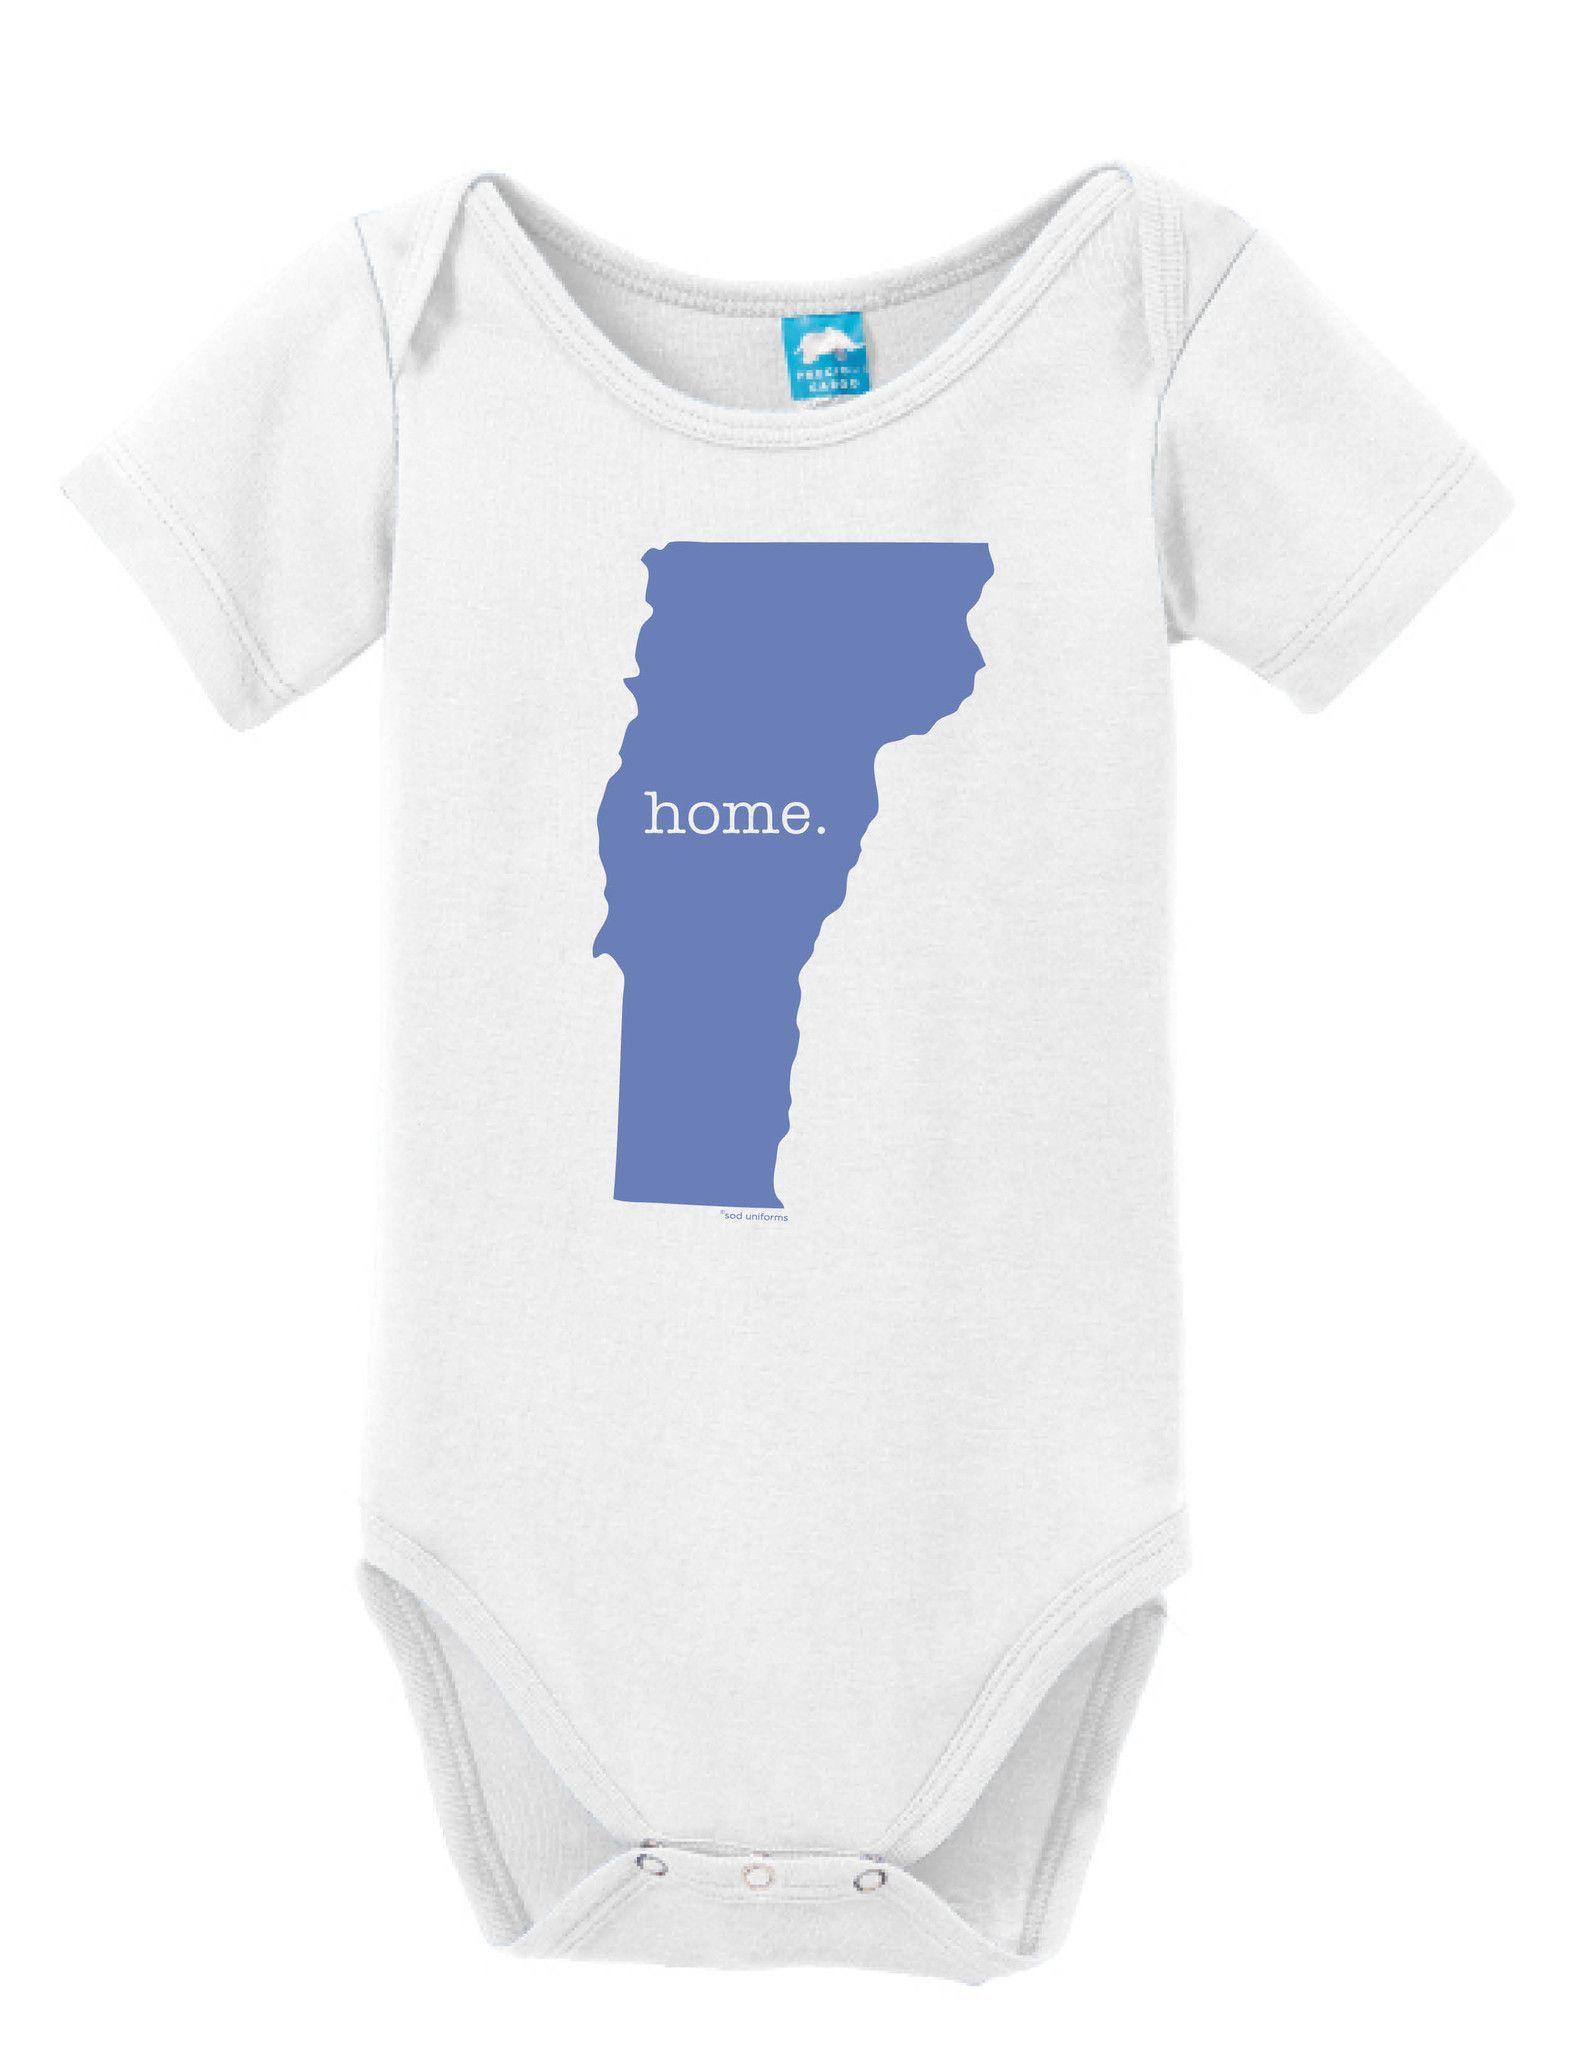 Vermont Home Onesie Funny Bodysuit Baby Romper